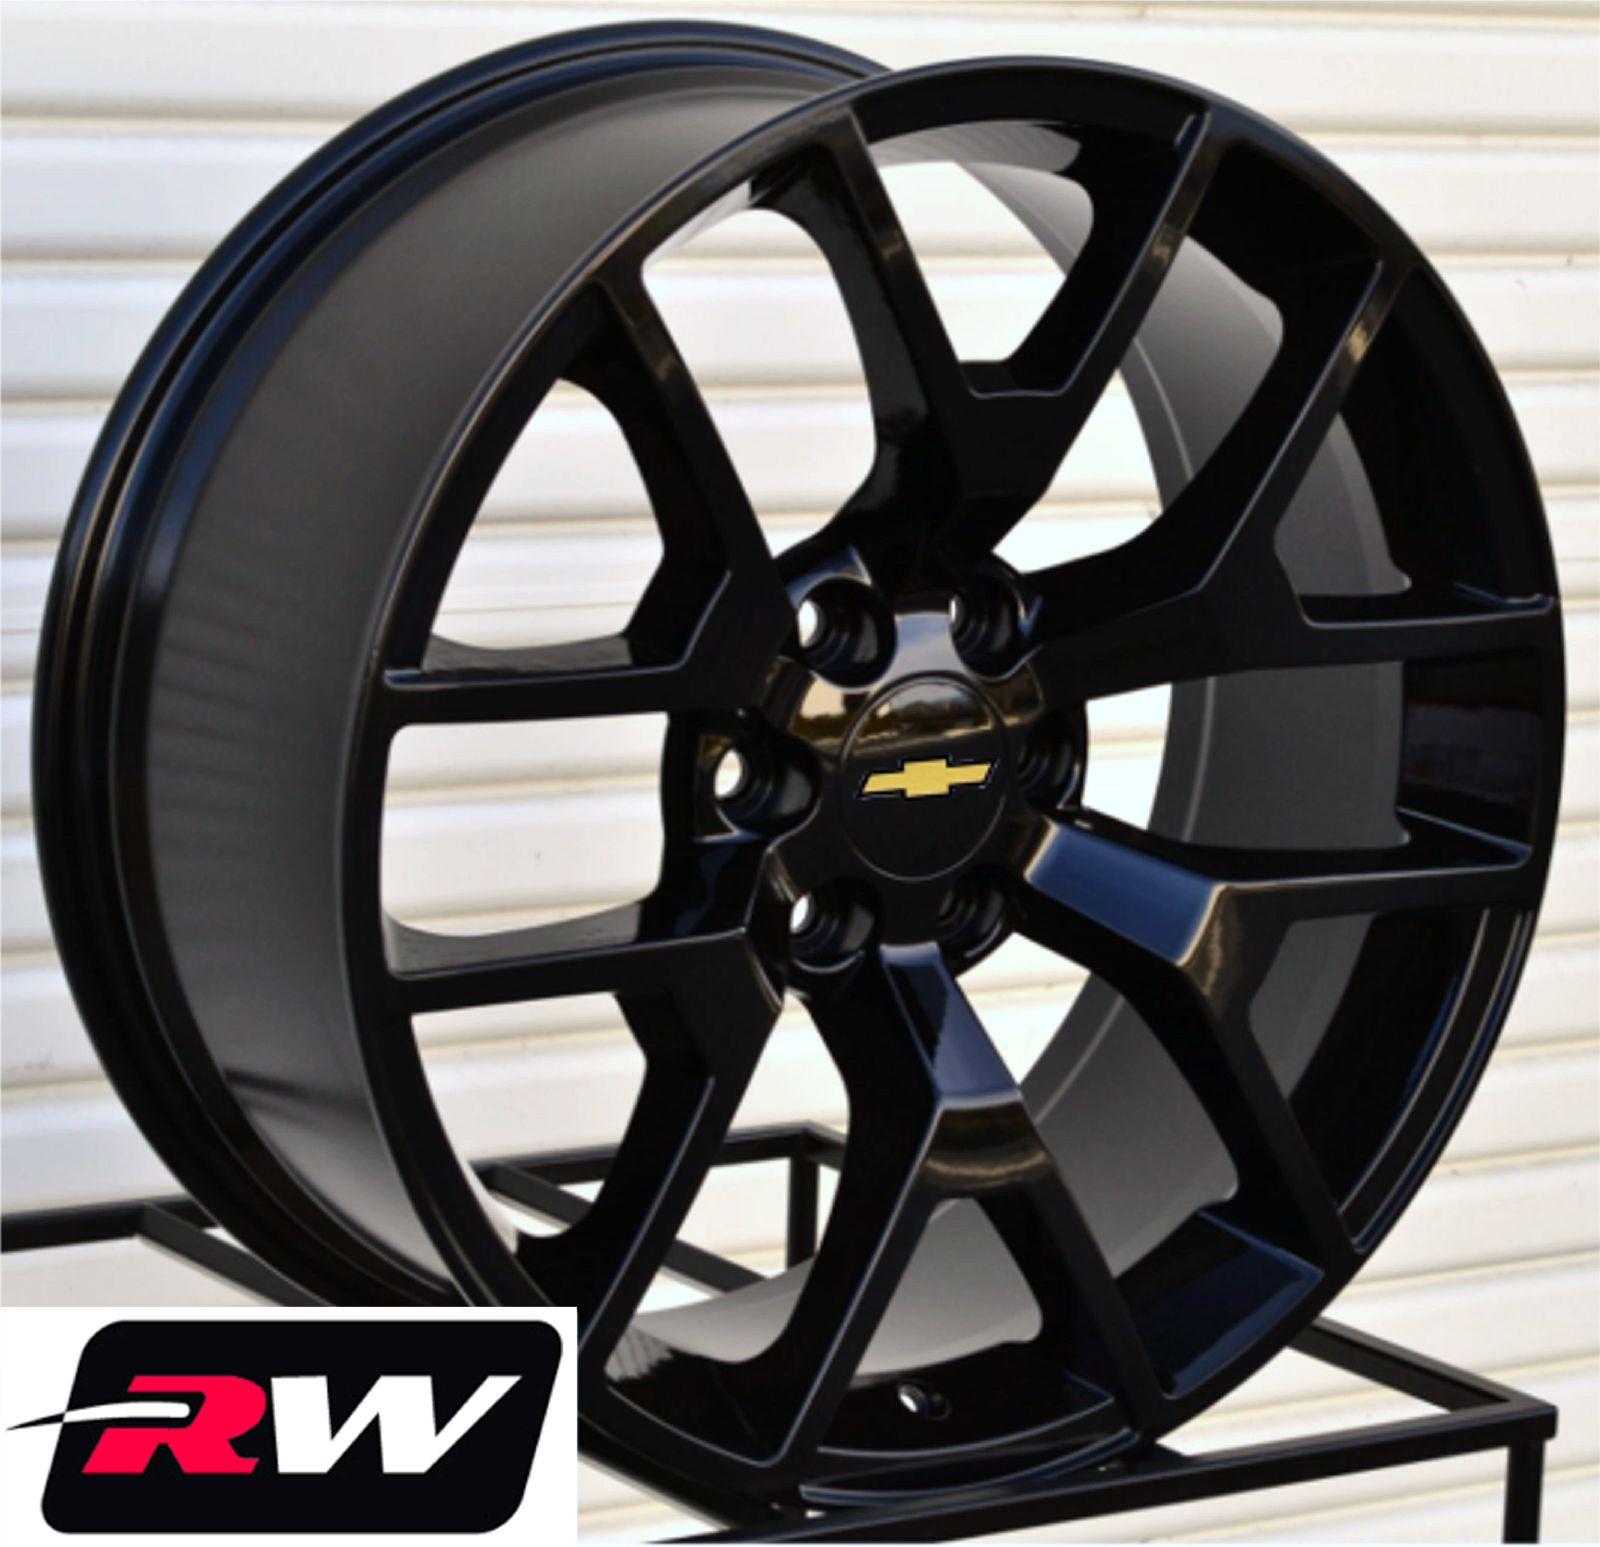 50 Inch Rims On Chevy : Gmc sierra wheels inch gloss black quot rims fit